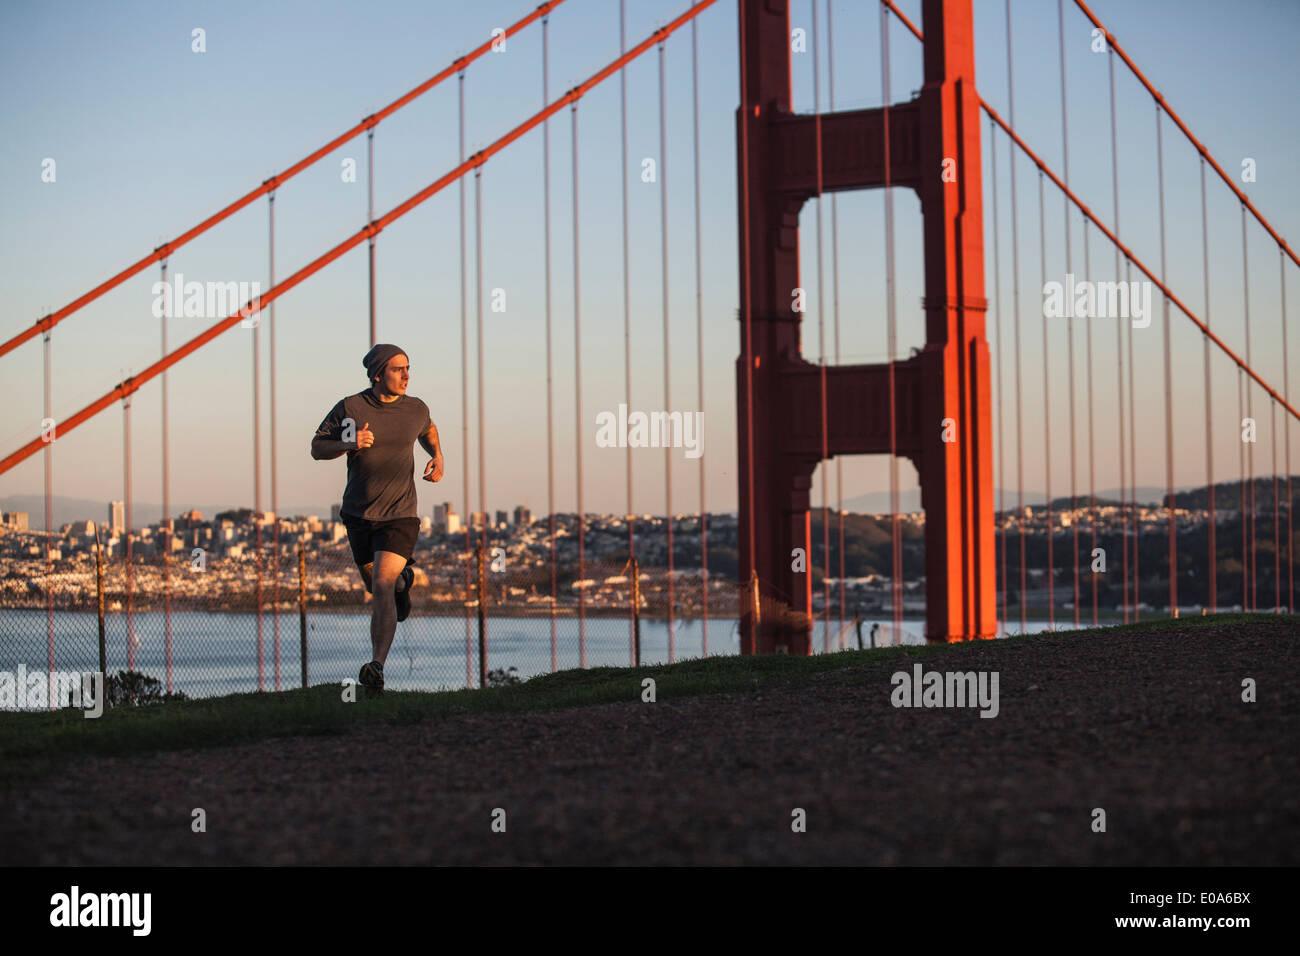 Young man out running near golden gate bridge - Stock Image